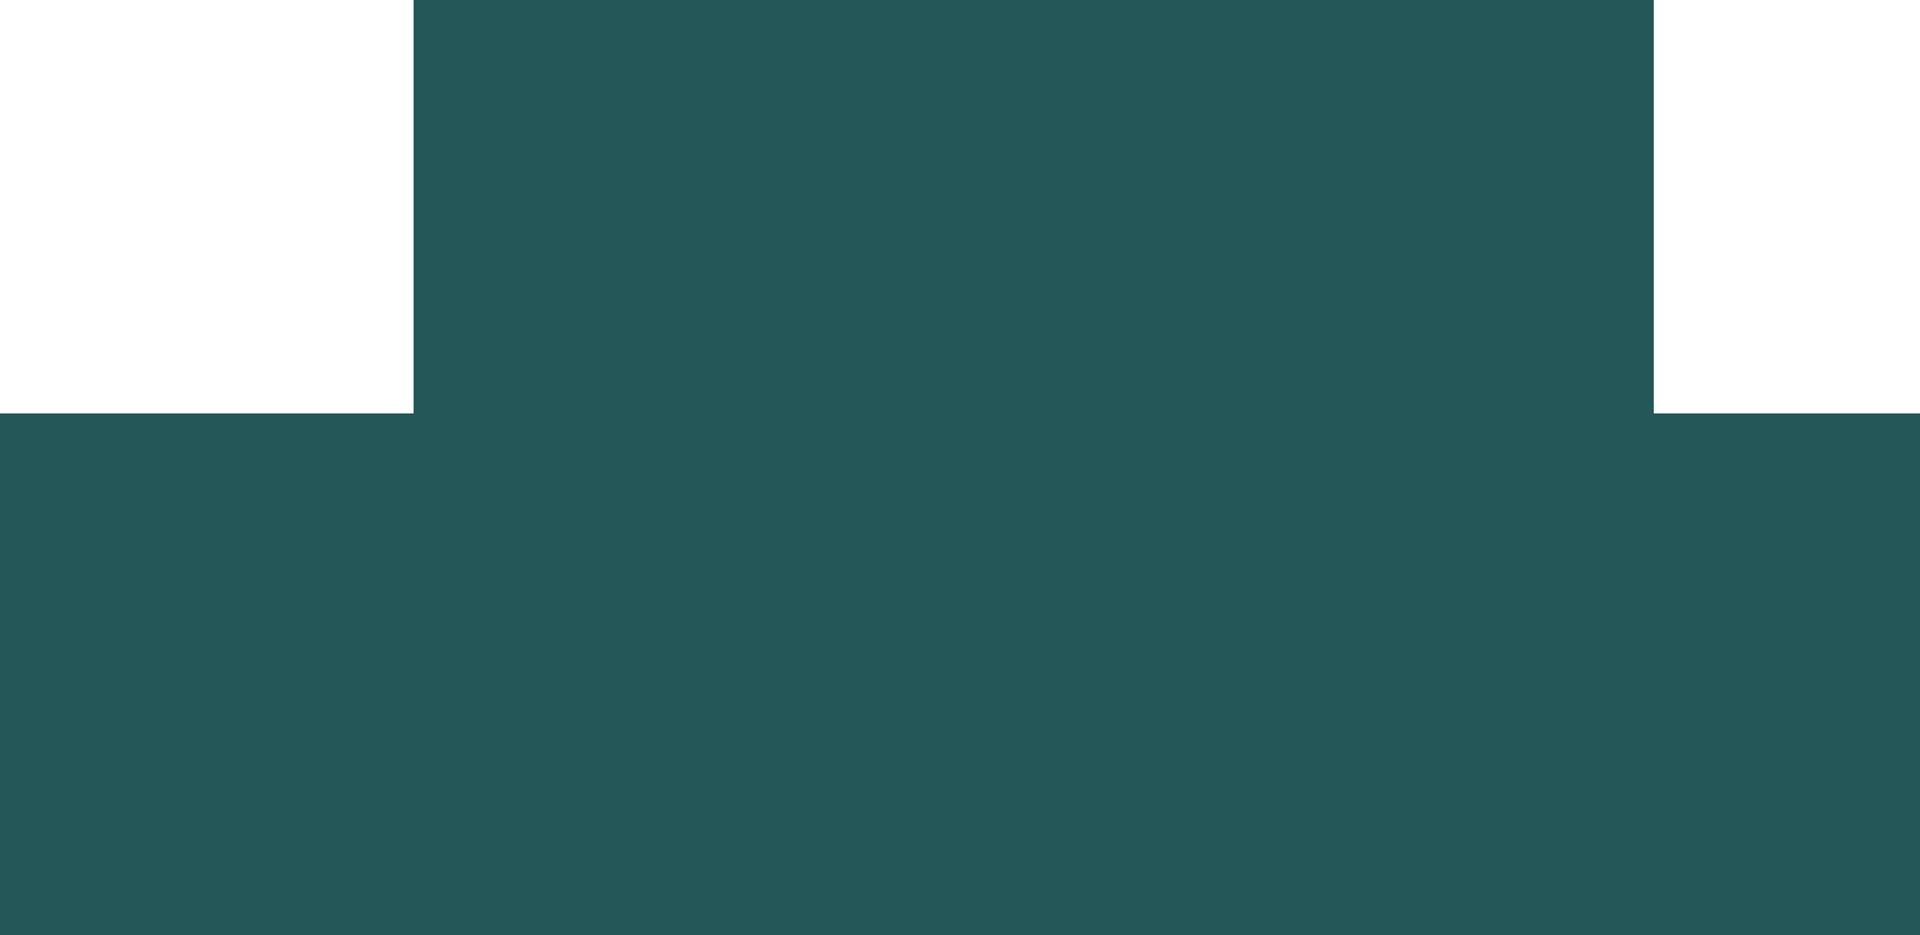 FranzK-tuerkis